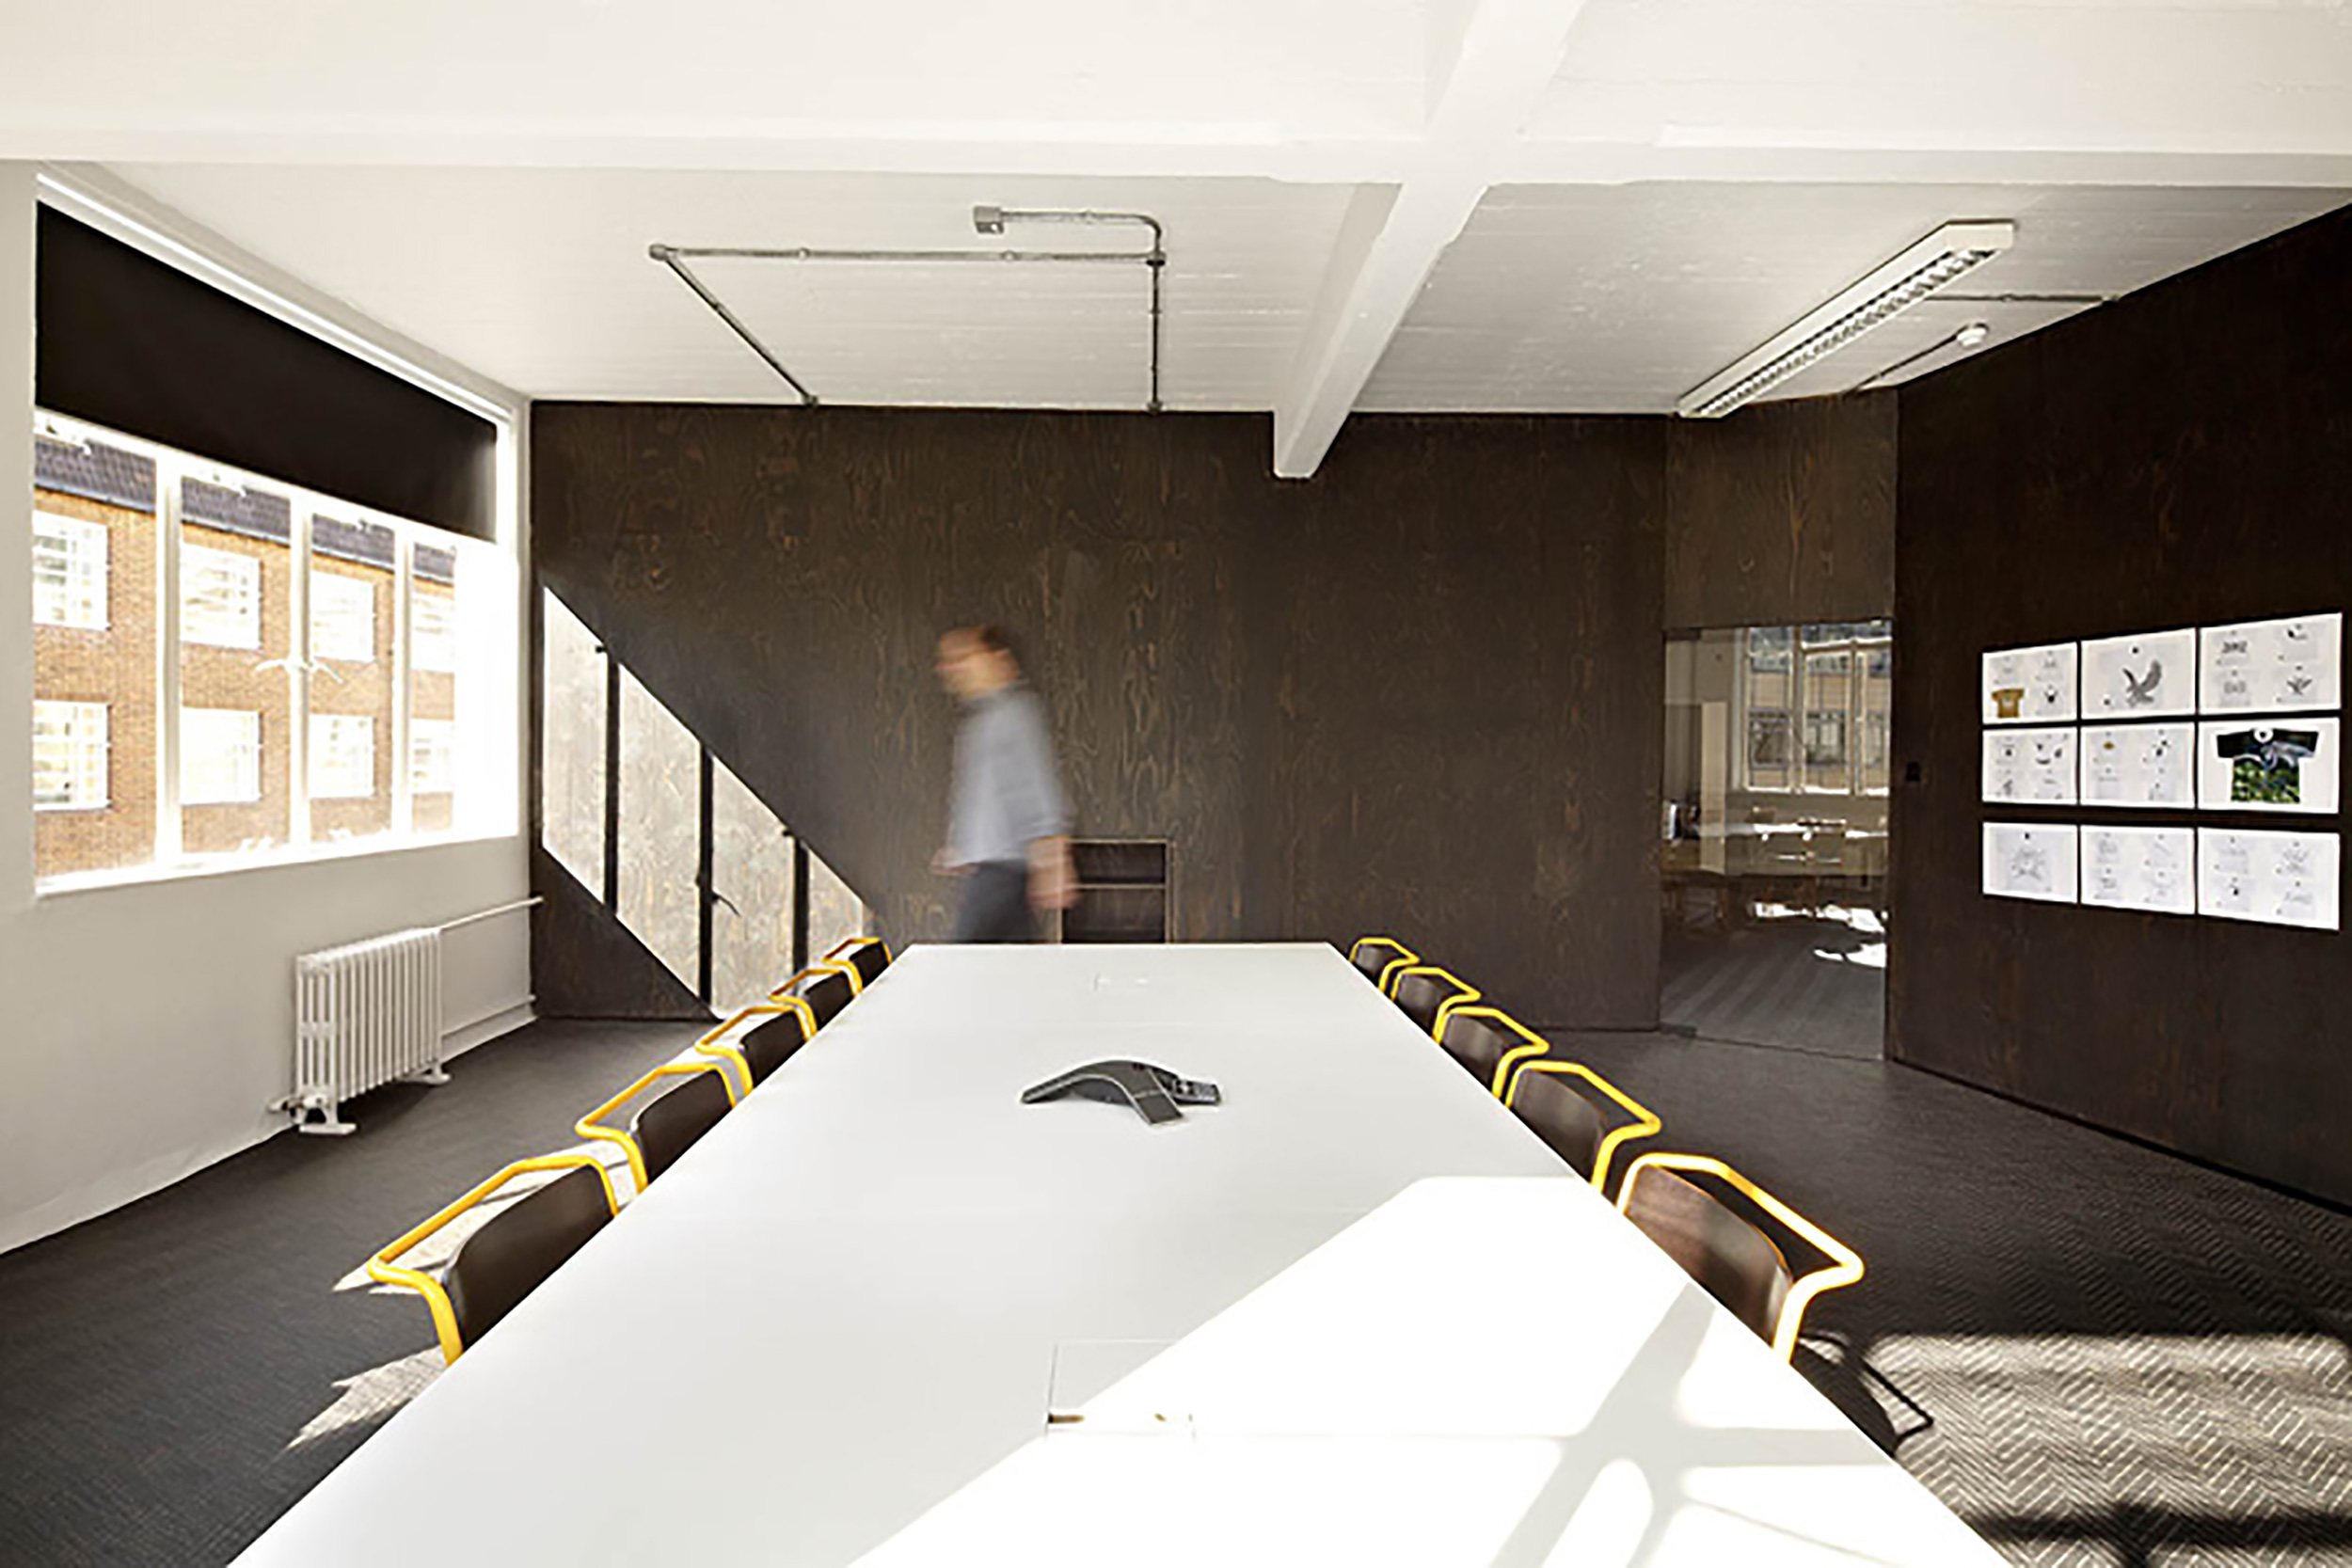 18-Feet-Rising-office-by-Studio-Octopi-London-05.jpg